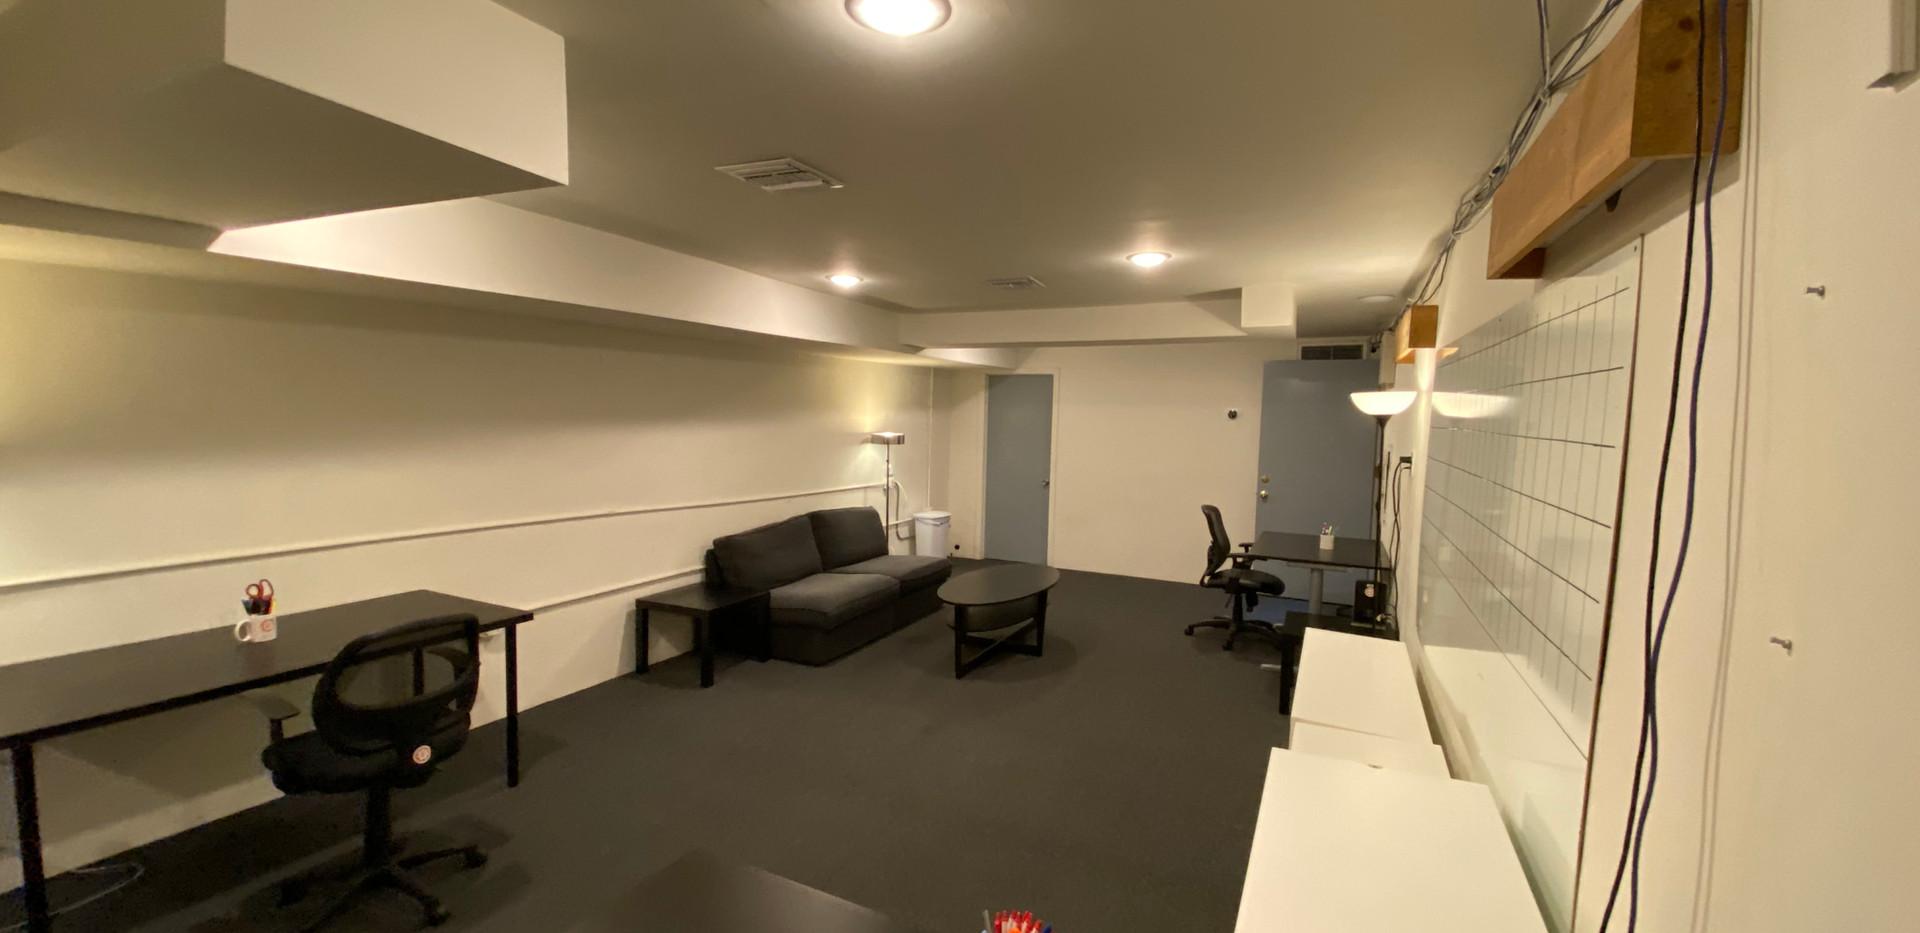 Room B4